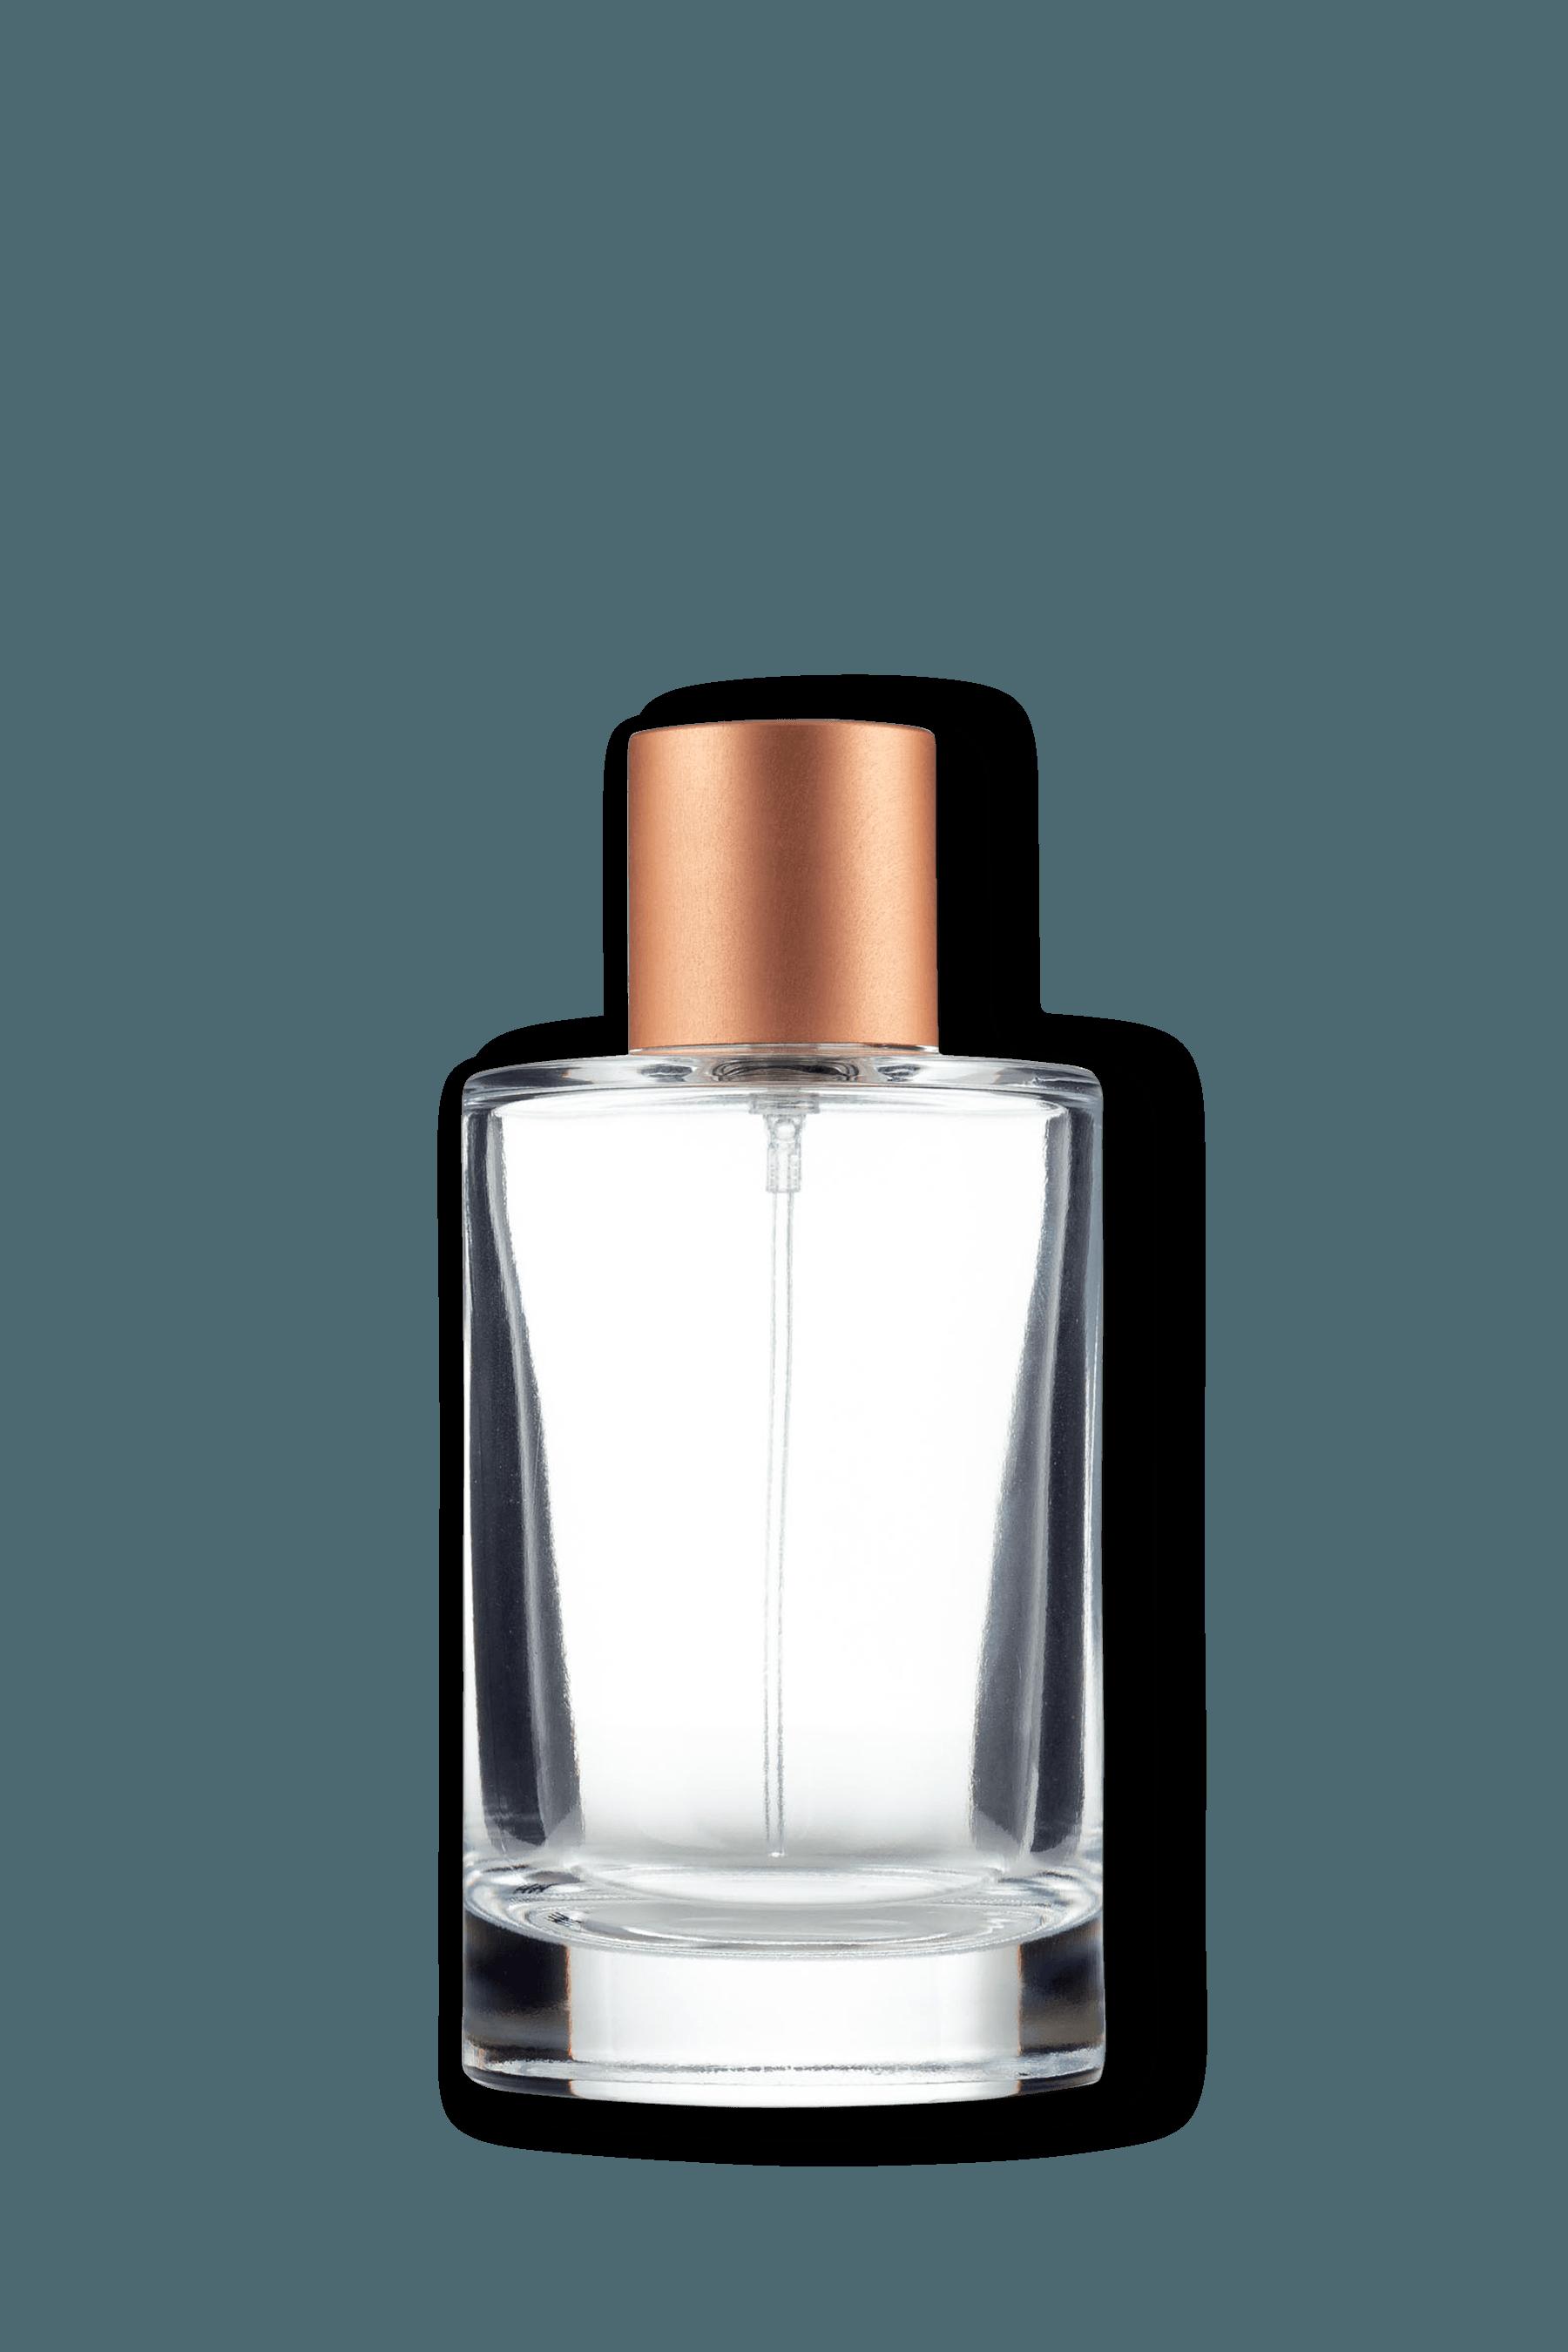 Perfume Glass Bottle decorative